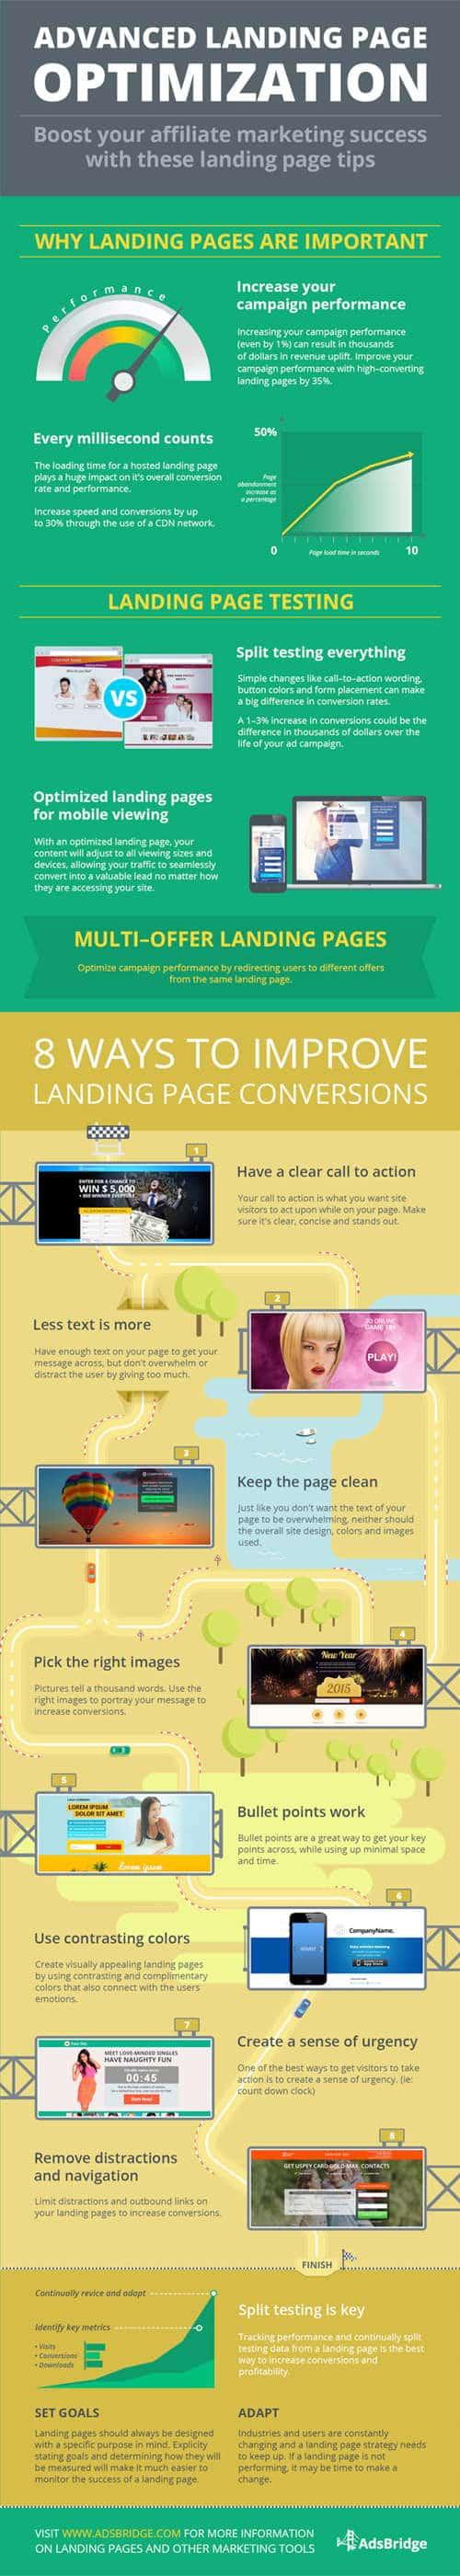 16 pasos para optimizar correctamente una landing page infografia